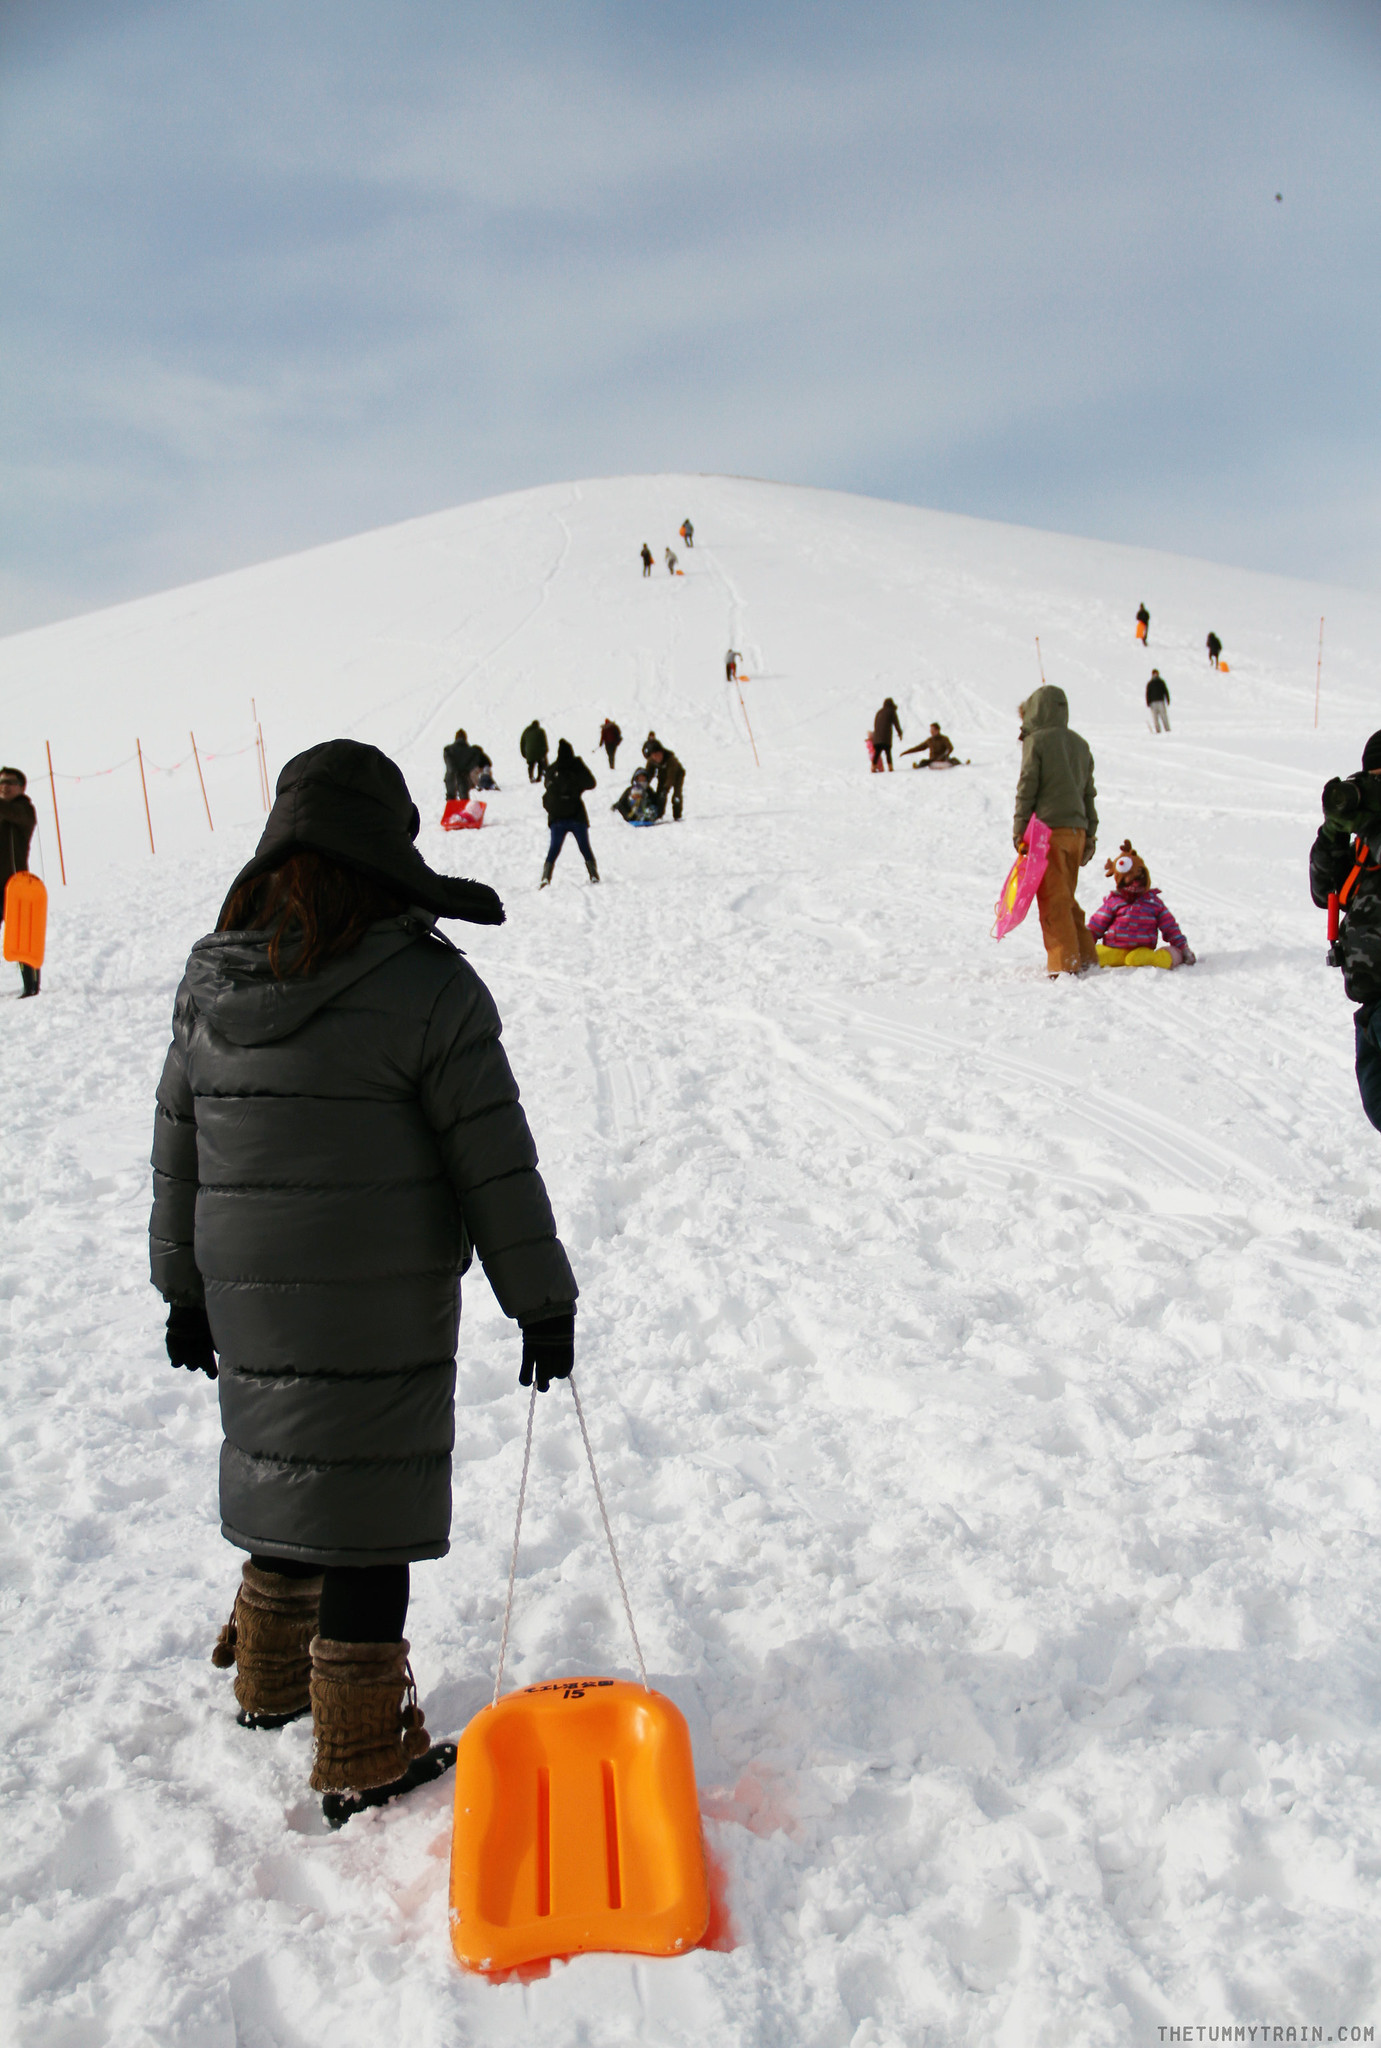 32792650641 9bef99de57 k - Sapporo Snow And Smile: 8 Unforgettable Winter Experiences in Sapporo City